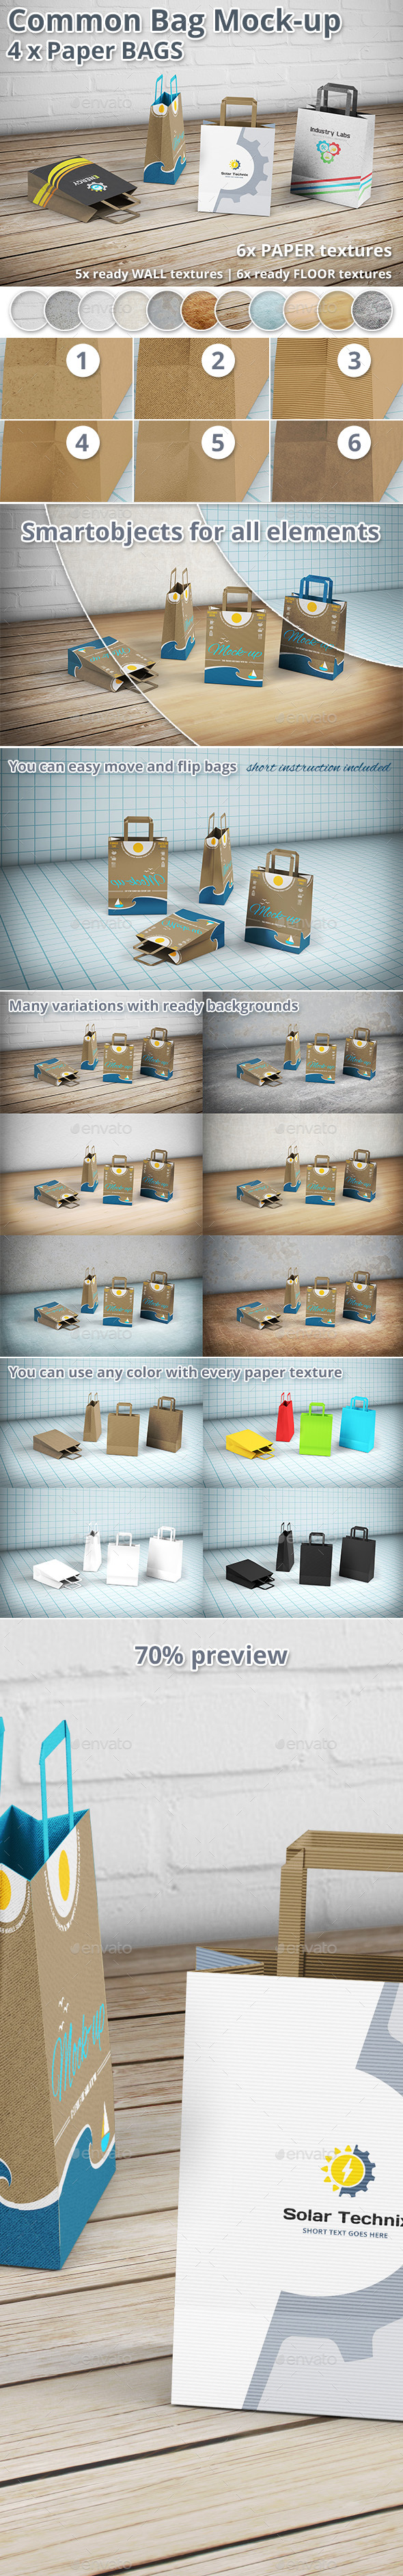 Paper Bag Mockup - Shopping Bag - Packaging Product Mock-Ups